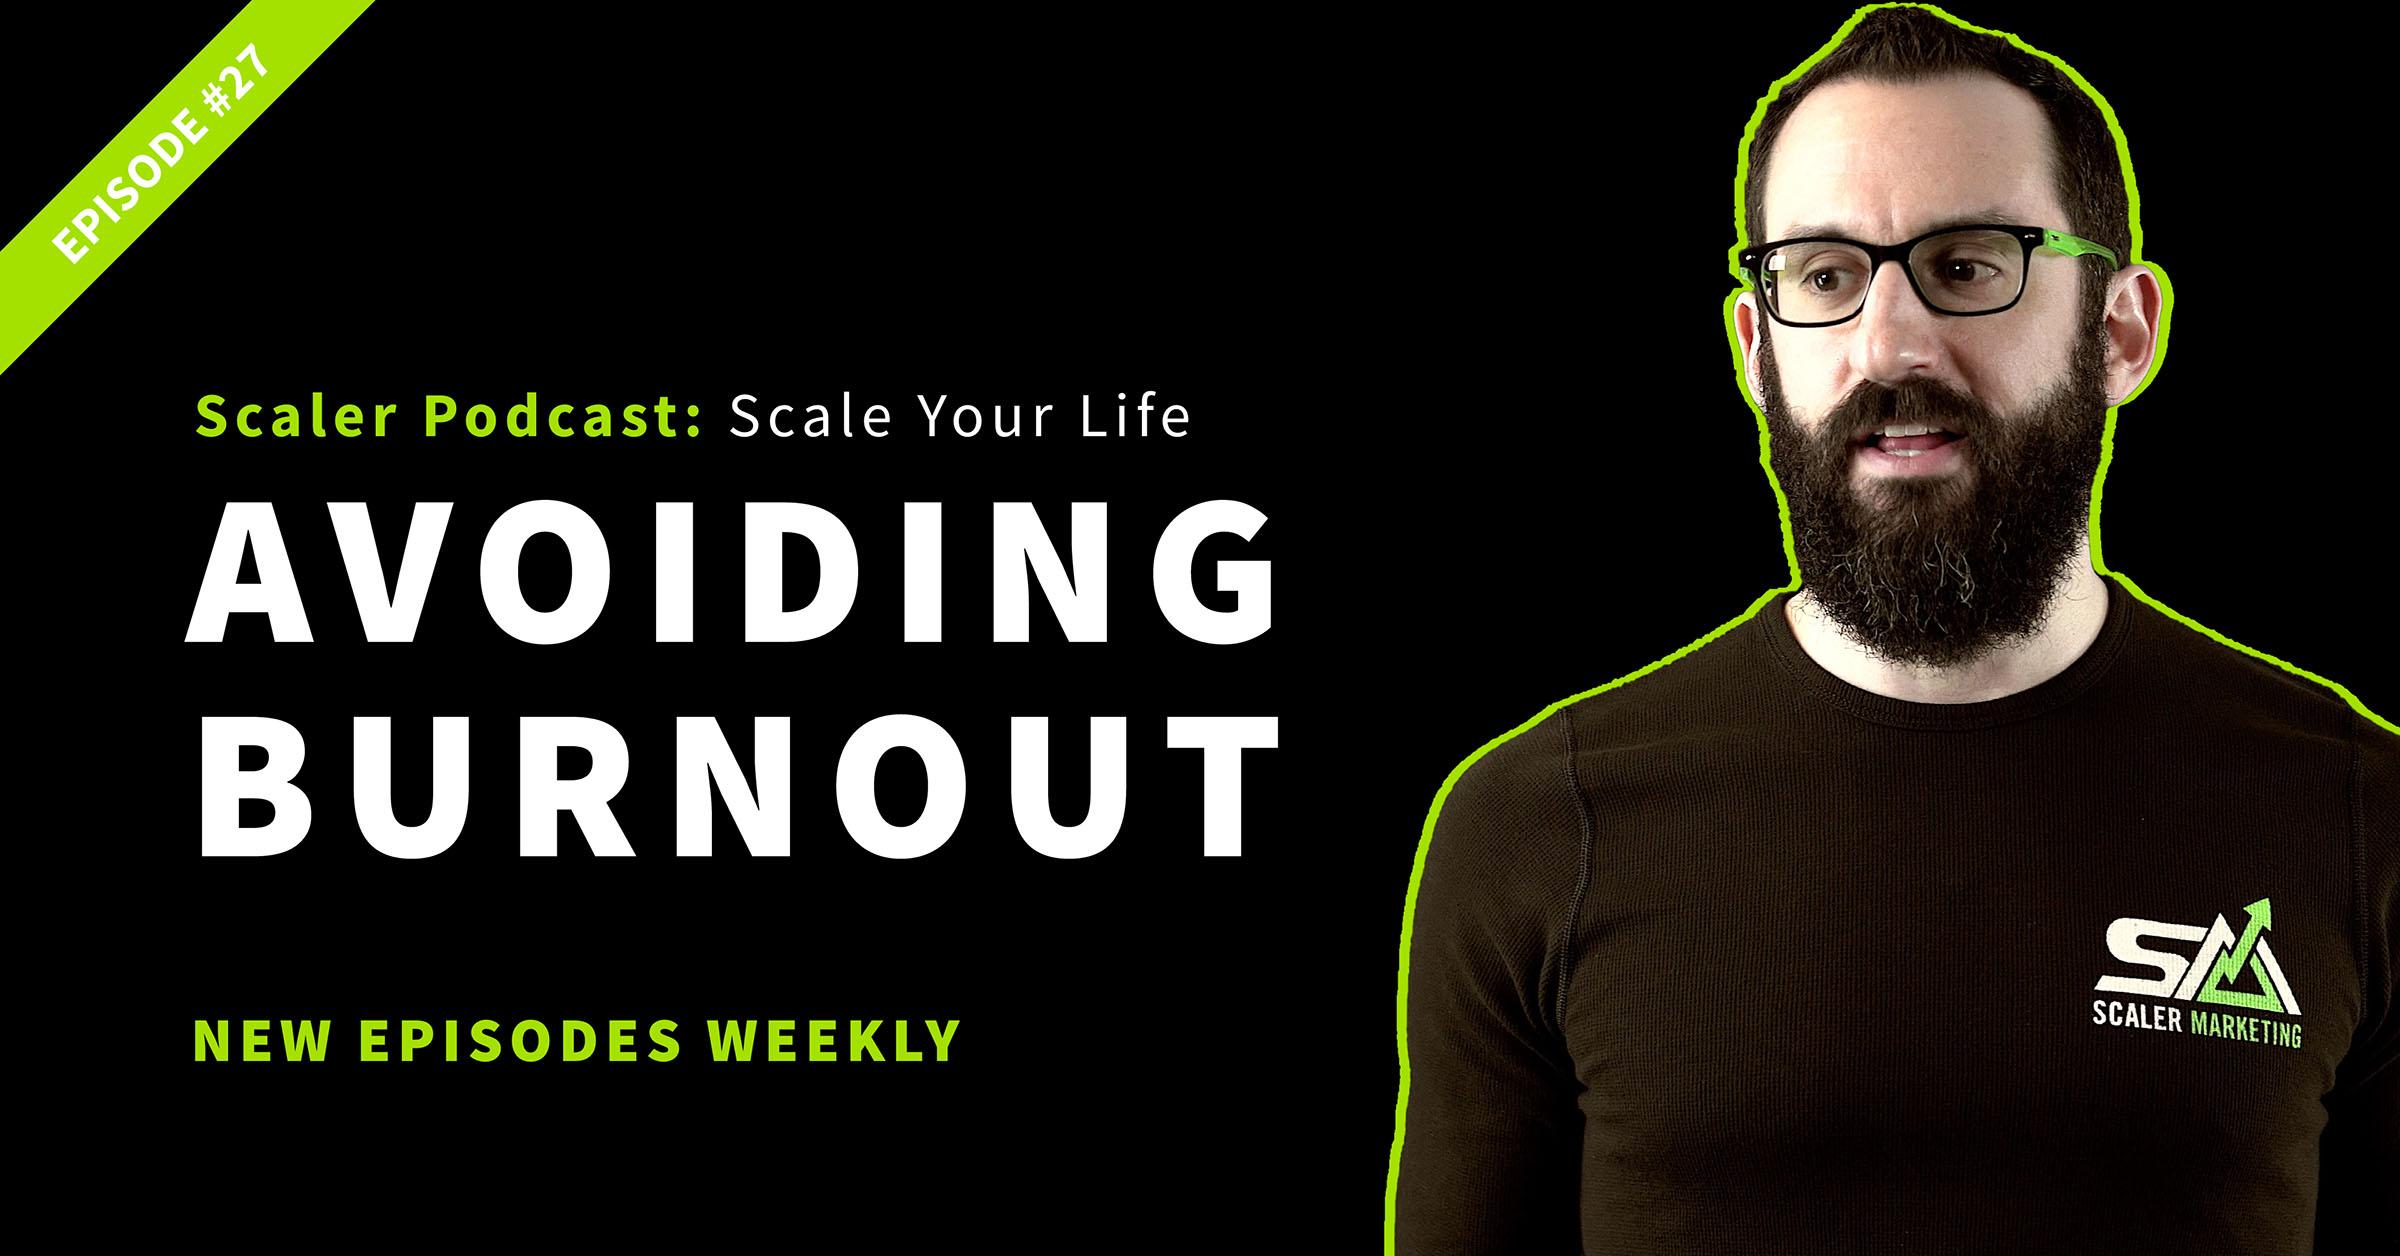 Episode 27 - Avoiding Burnout